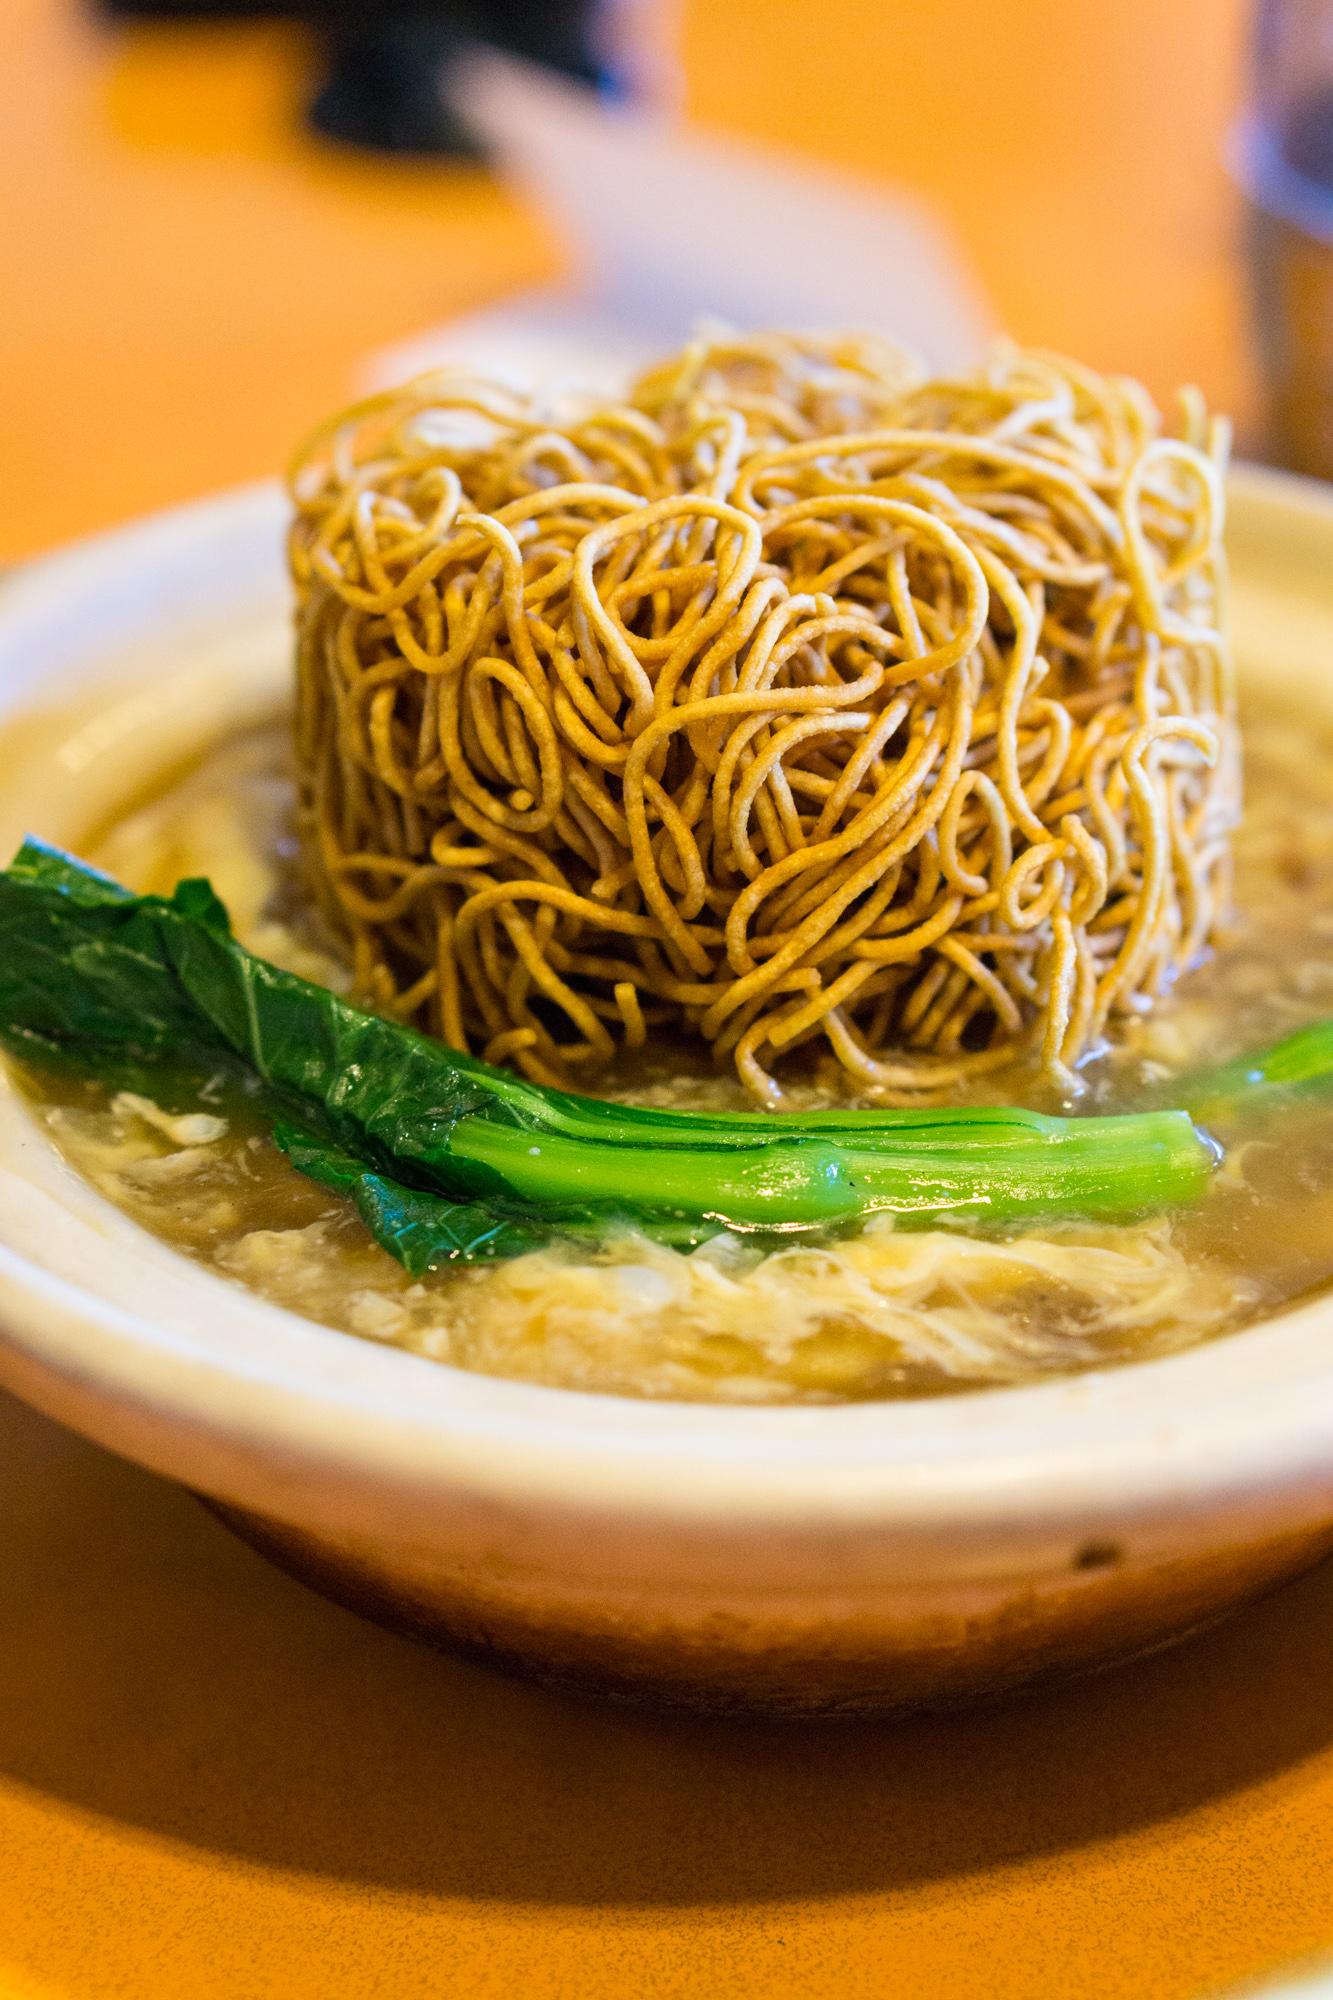 Kopi Tiam Swissotel The Stamford - Claypot Seafood Crispy Noodles